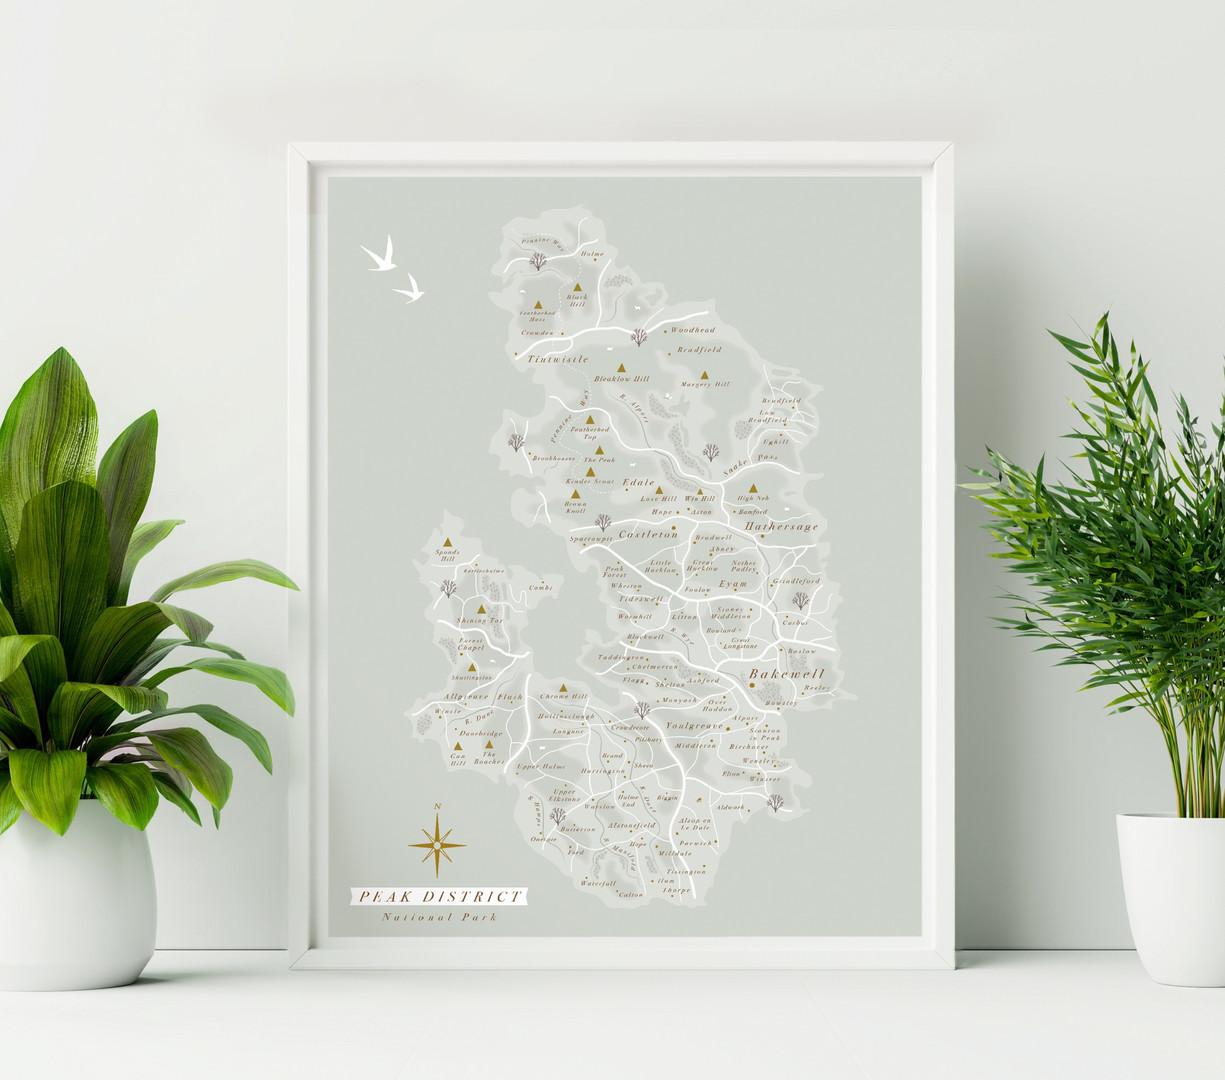 Peak District Wall Map